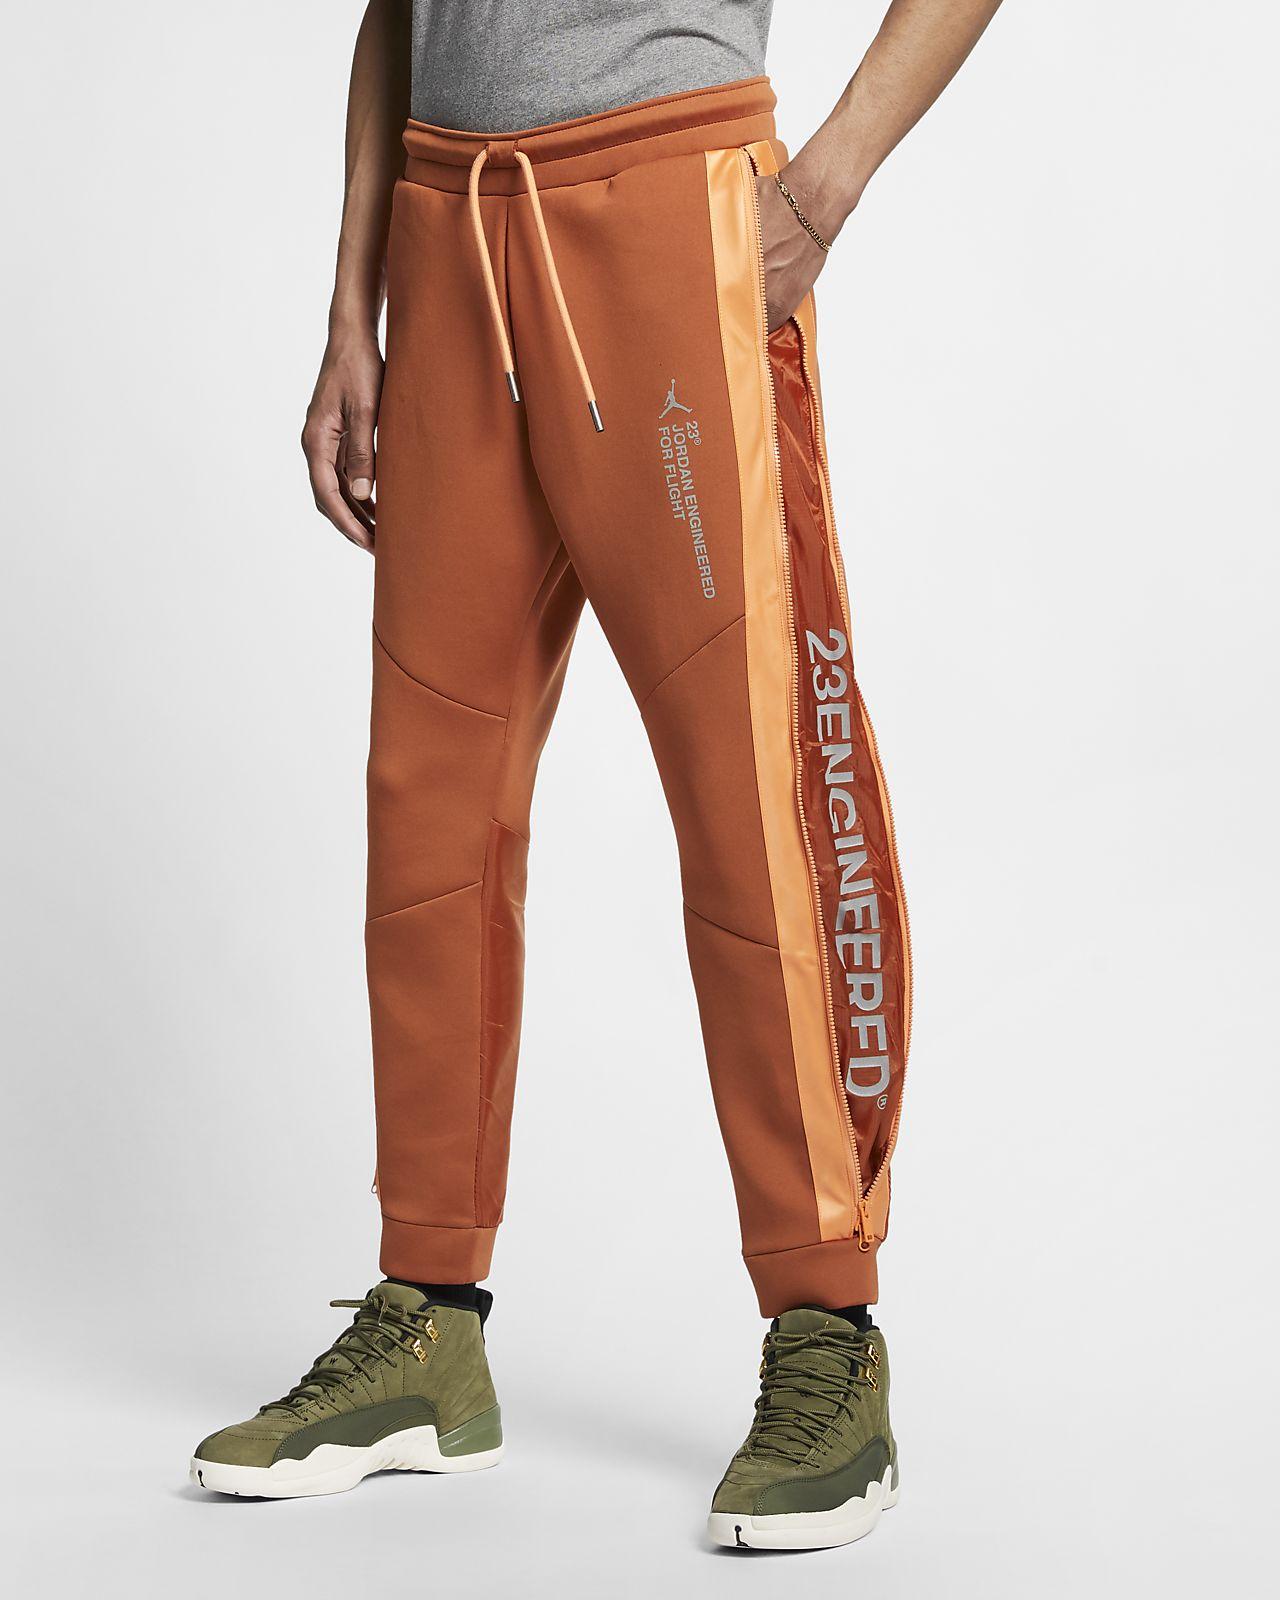 Pánské kalhoty Jordan 23 Engineered